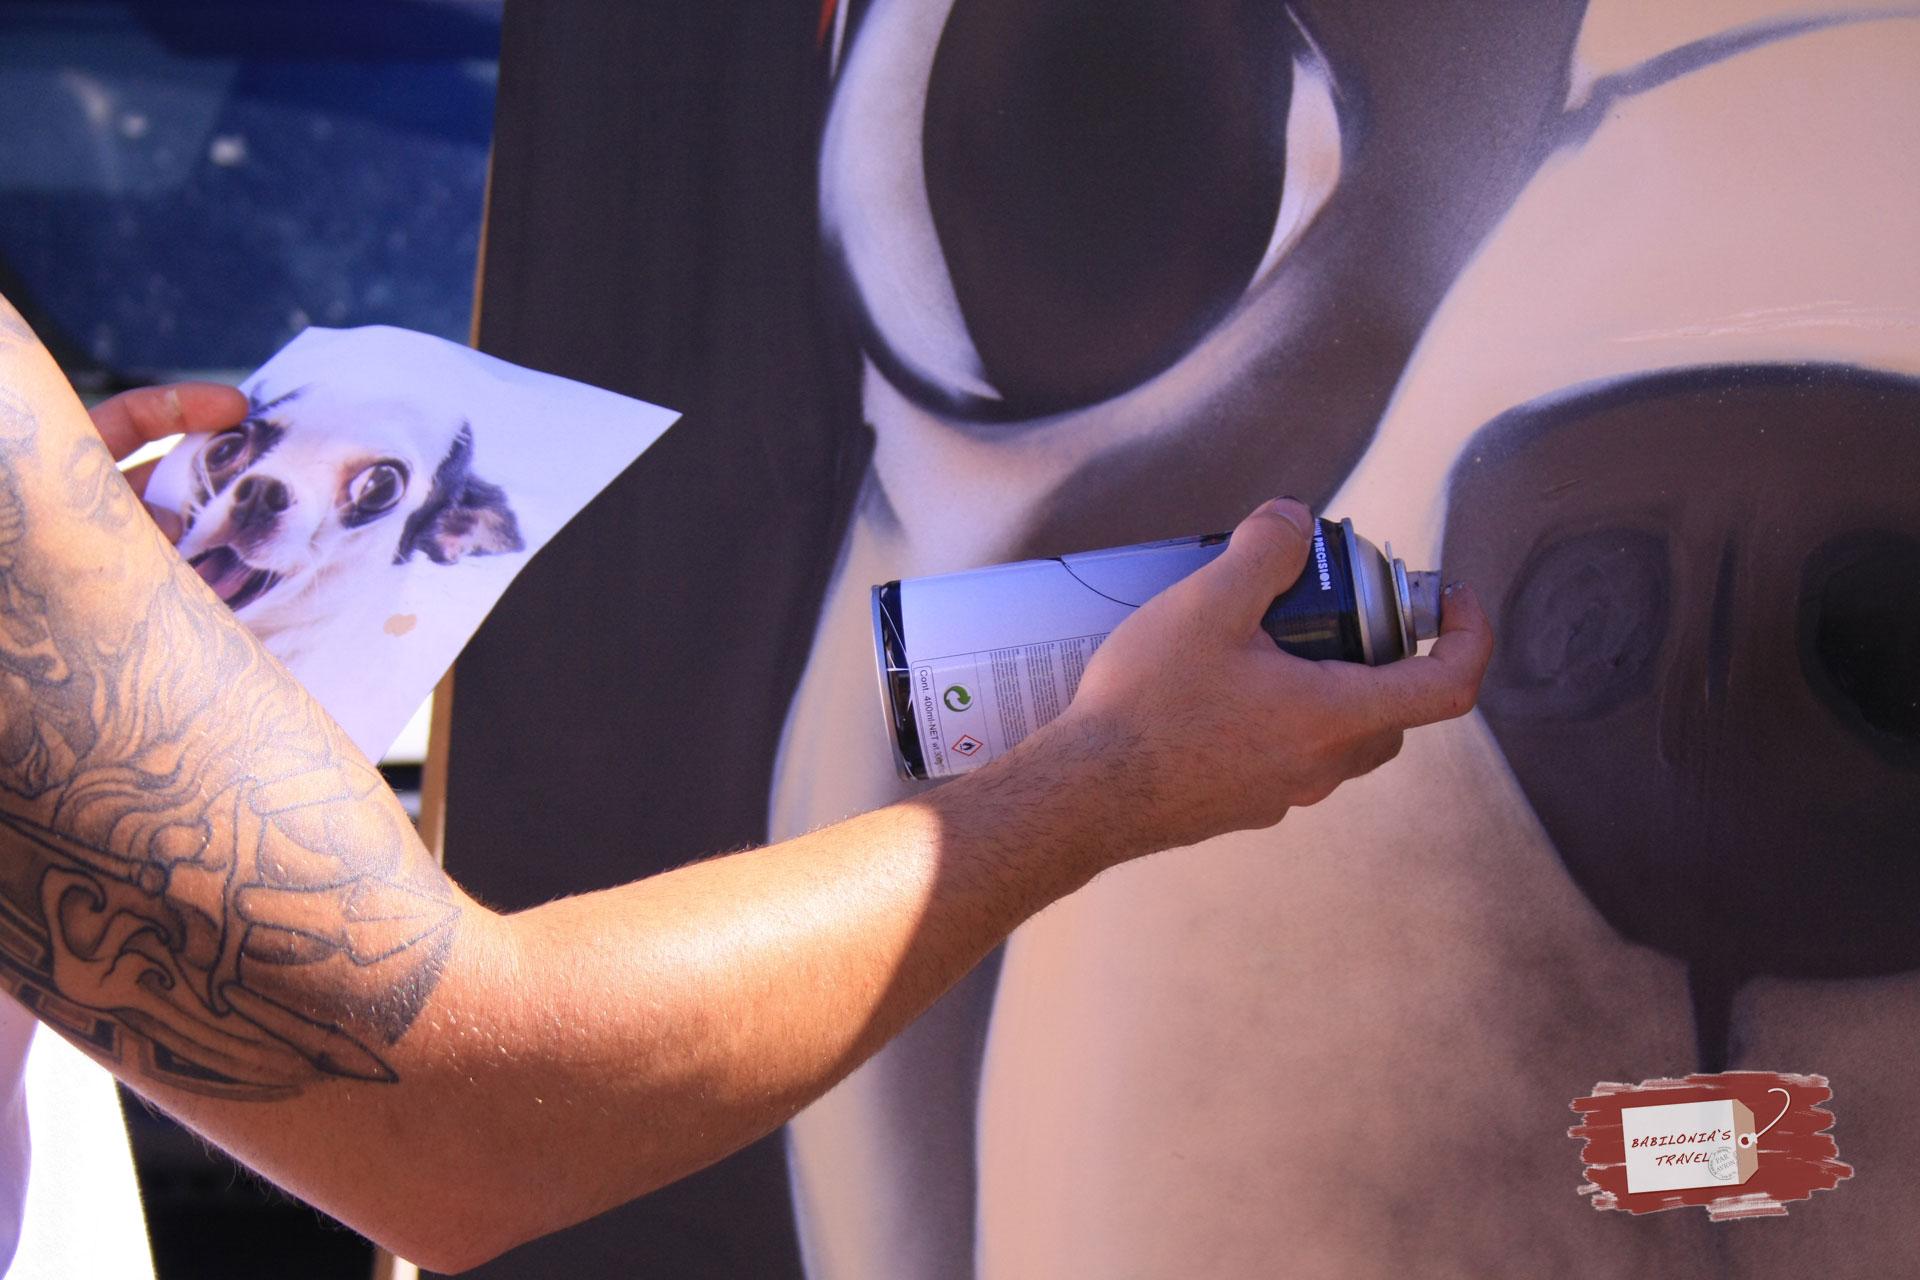 La (i)legalidad Del Grafiti Explicada Por El Artista